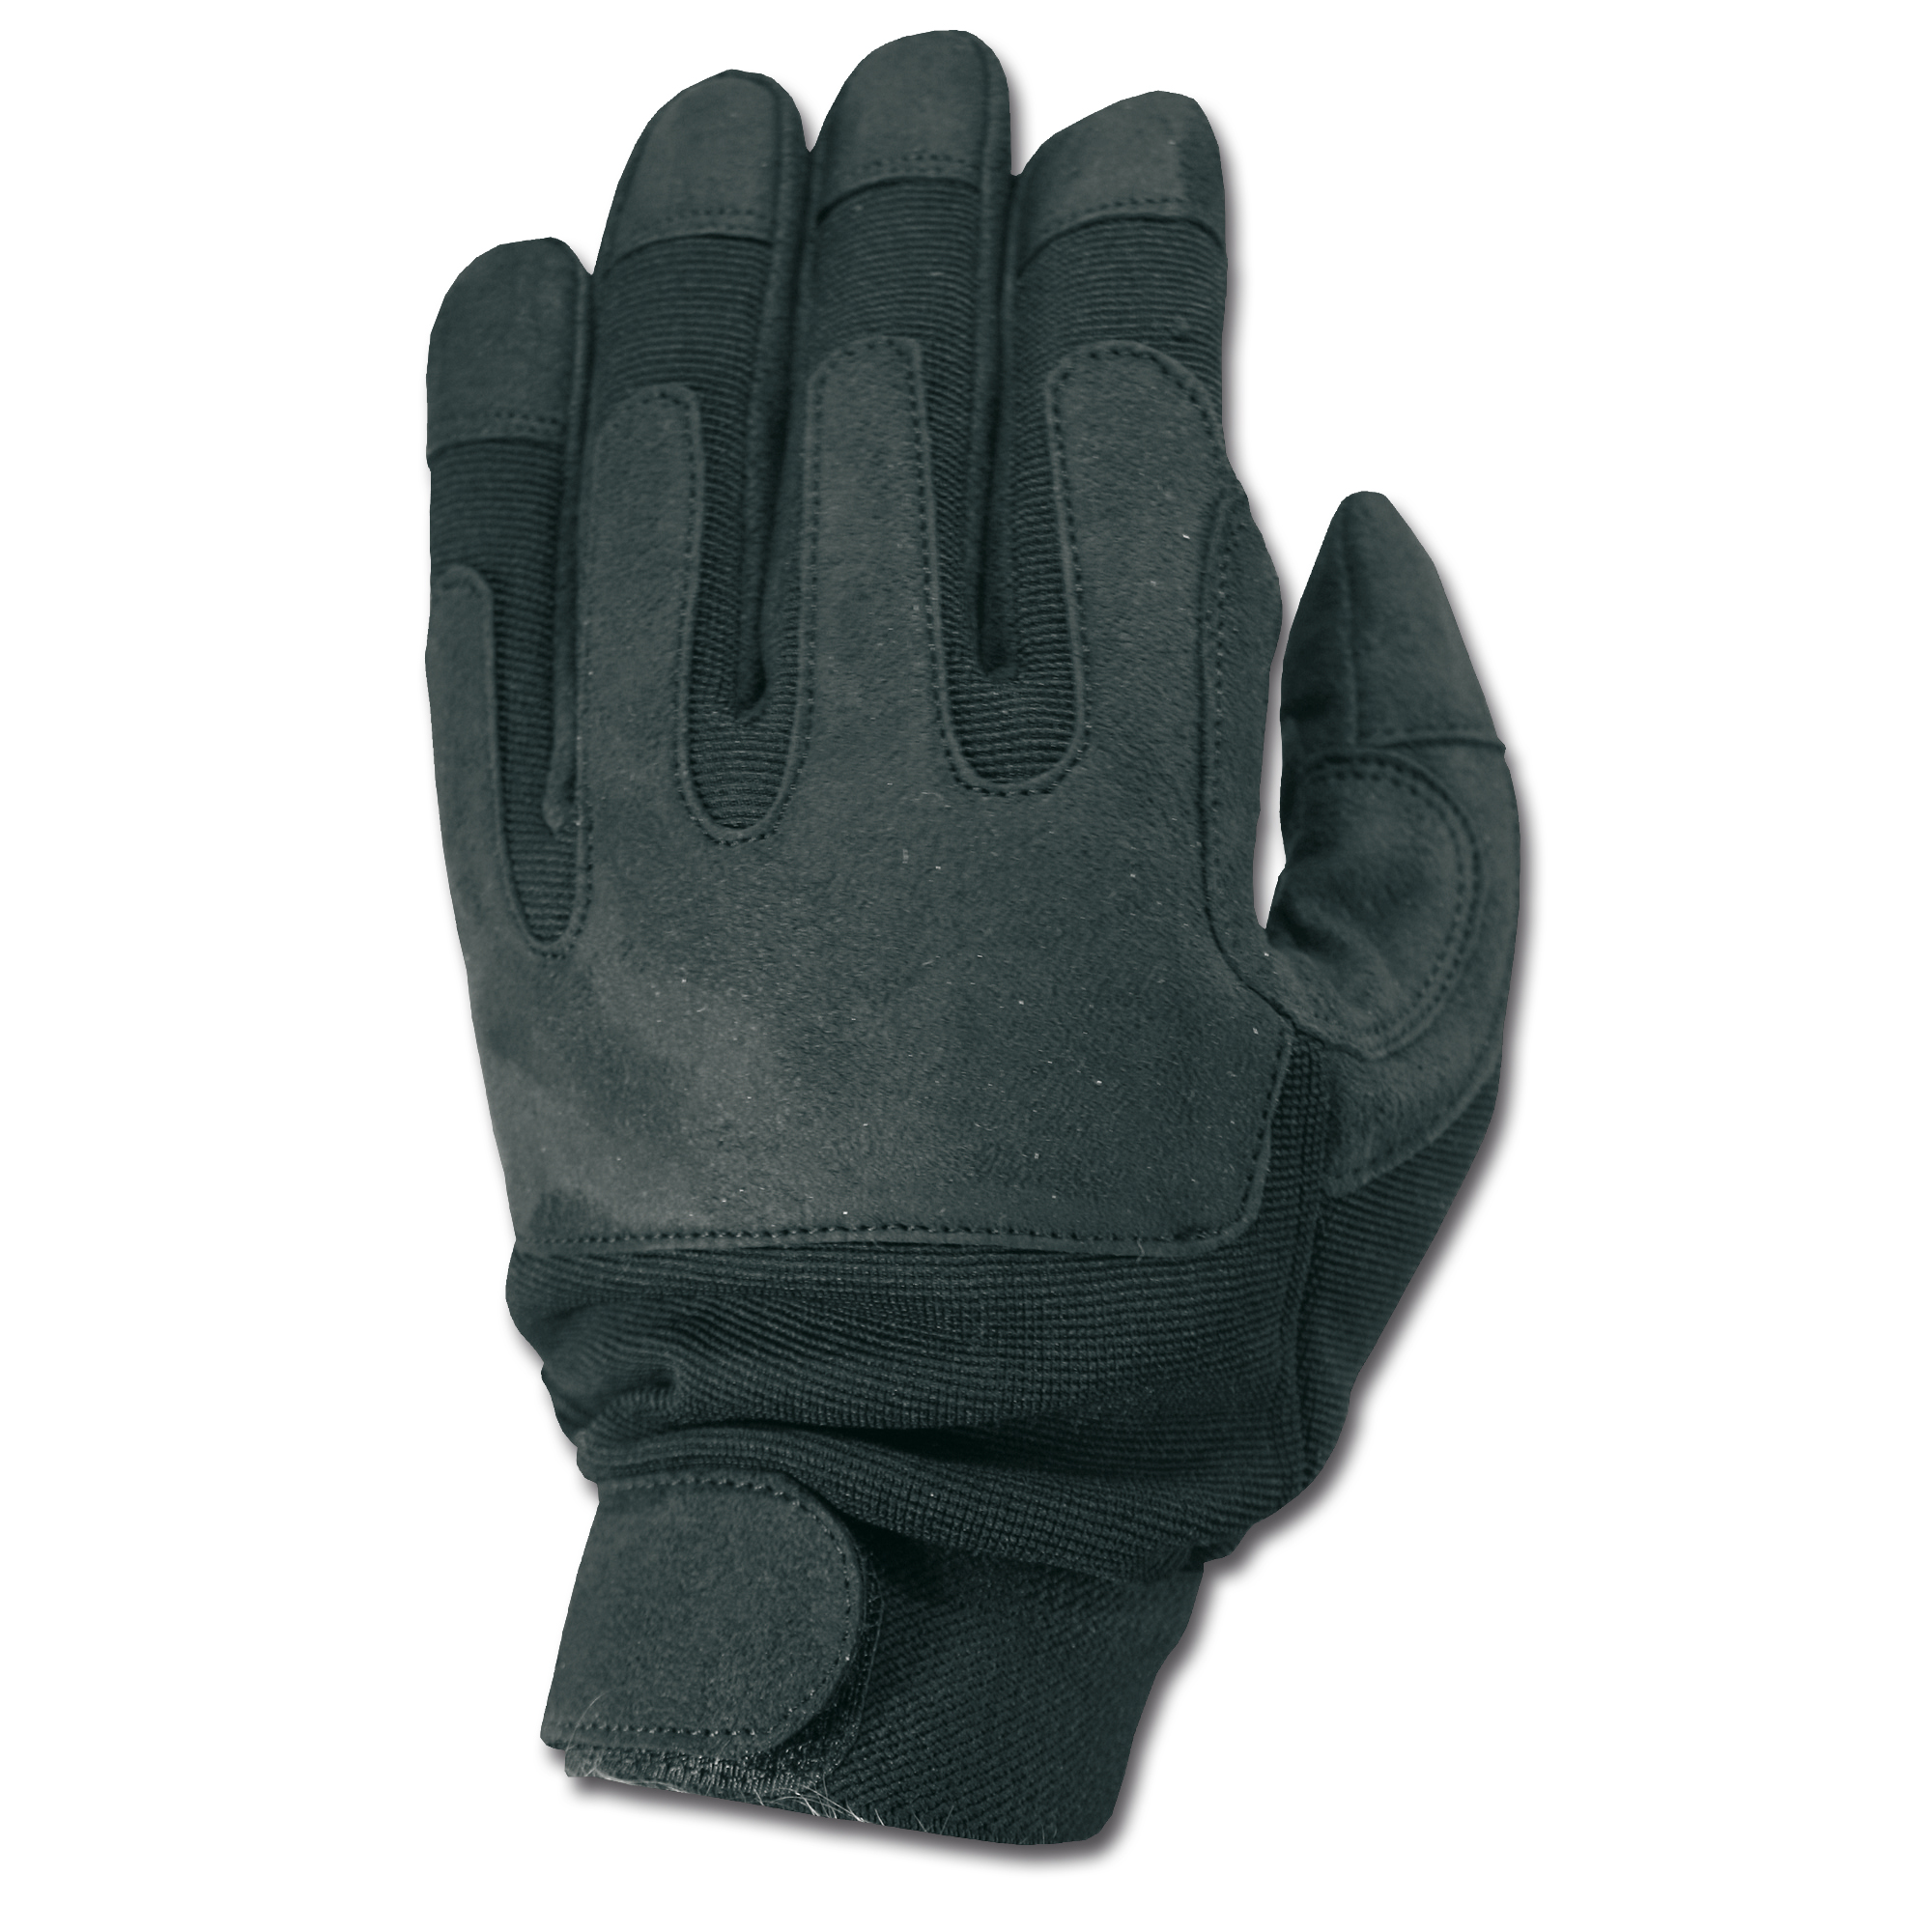 Army Gloves black